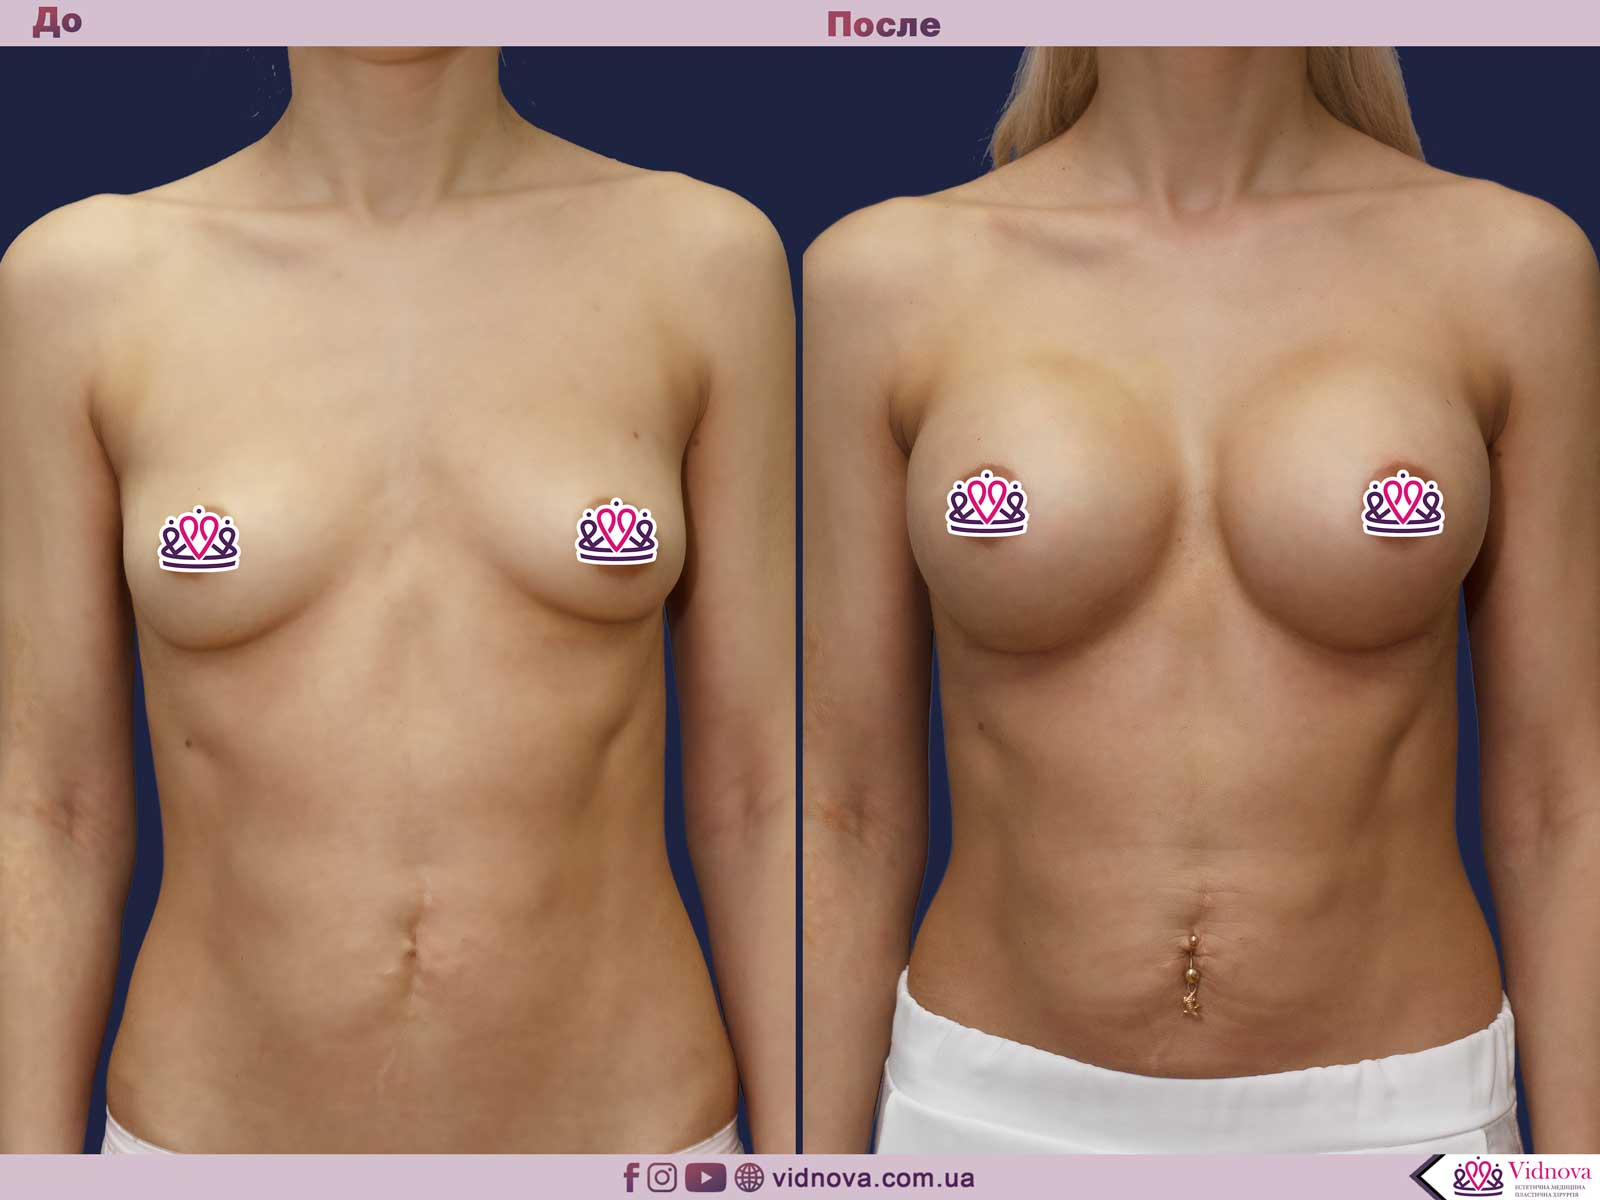 Увеличение груди: Фото ДО и ПОСЛЕ - Пример №63-1 - Клиника Vidnova